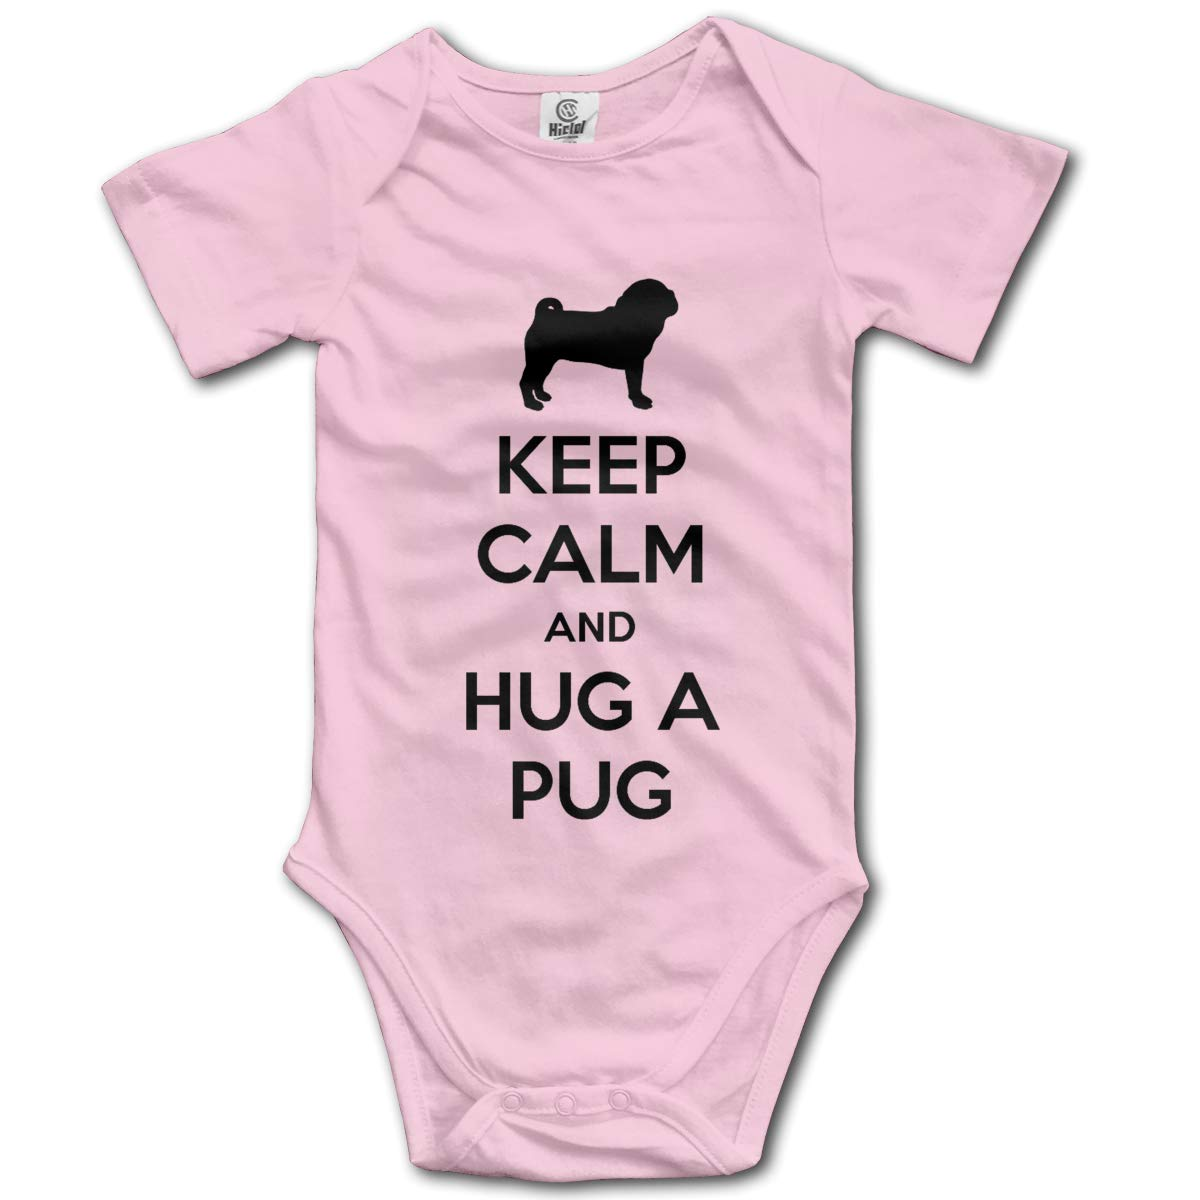 Baby Climbing Clothes Set Hug A Pug Bodysuits Romper Short Sleeved Light Onesies